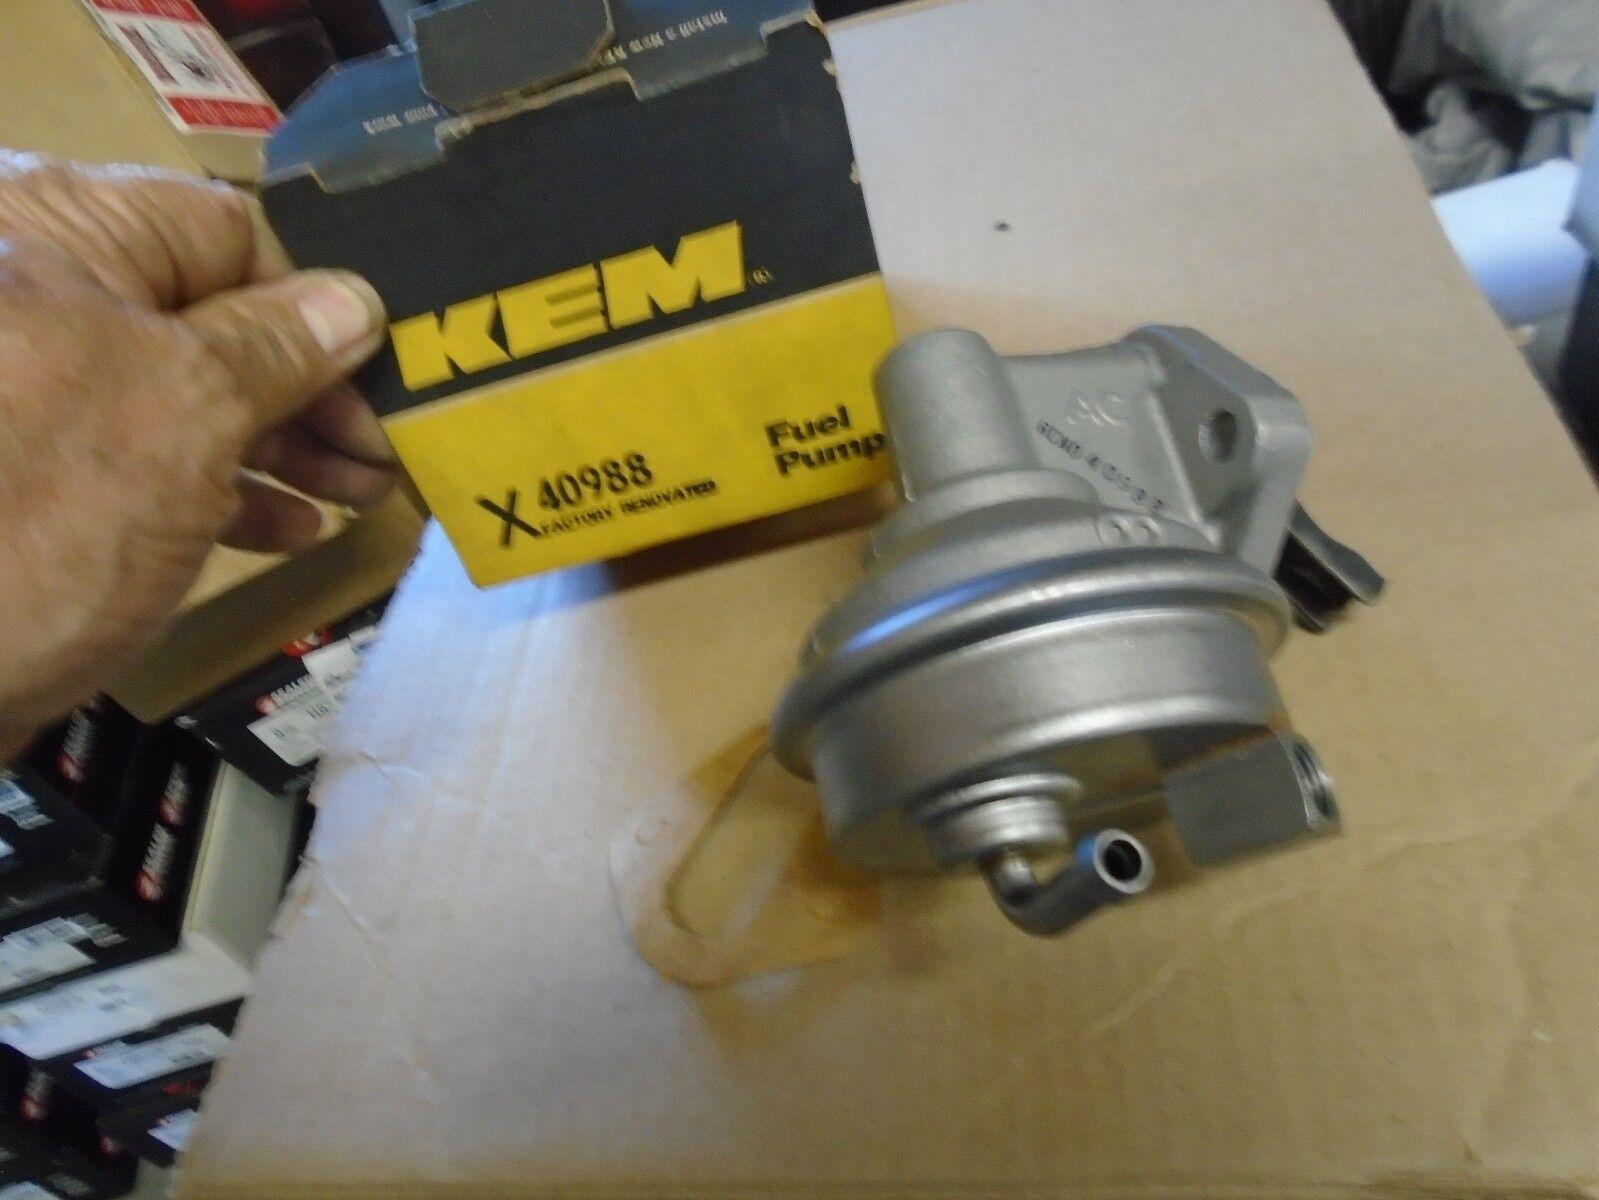 Used Pontiac Fuel Pumps For Sale 2009 G6 Filter